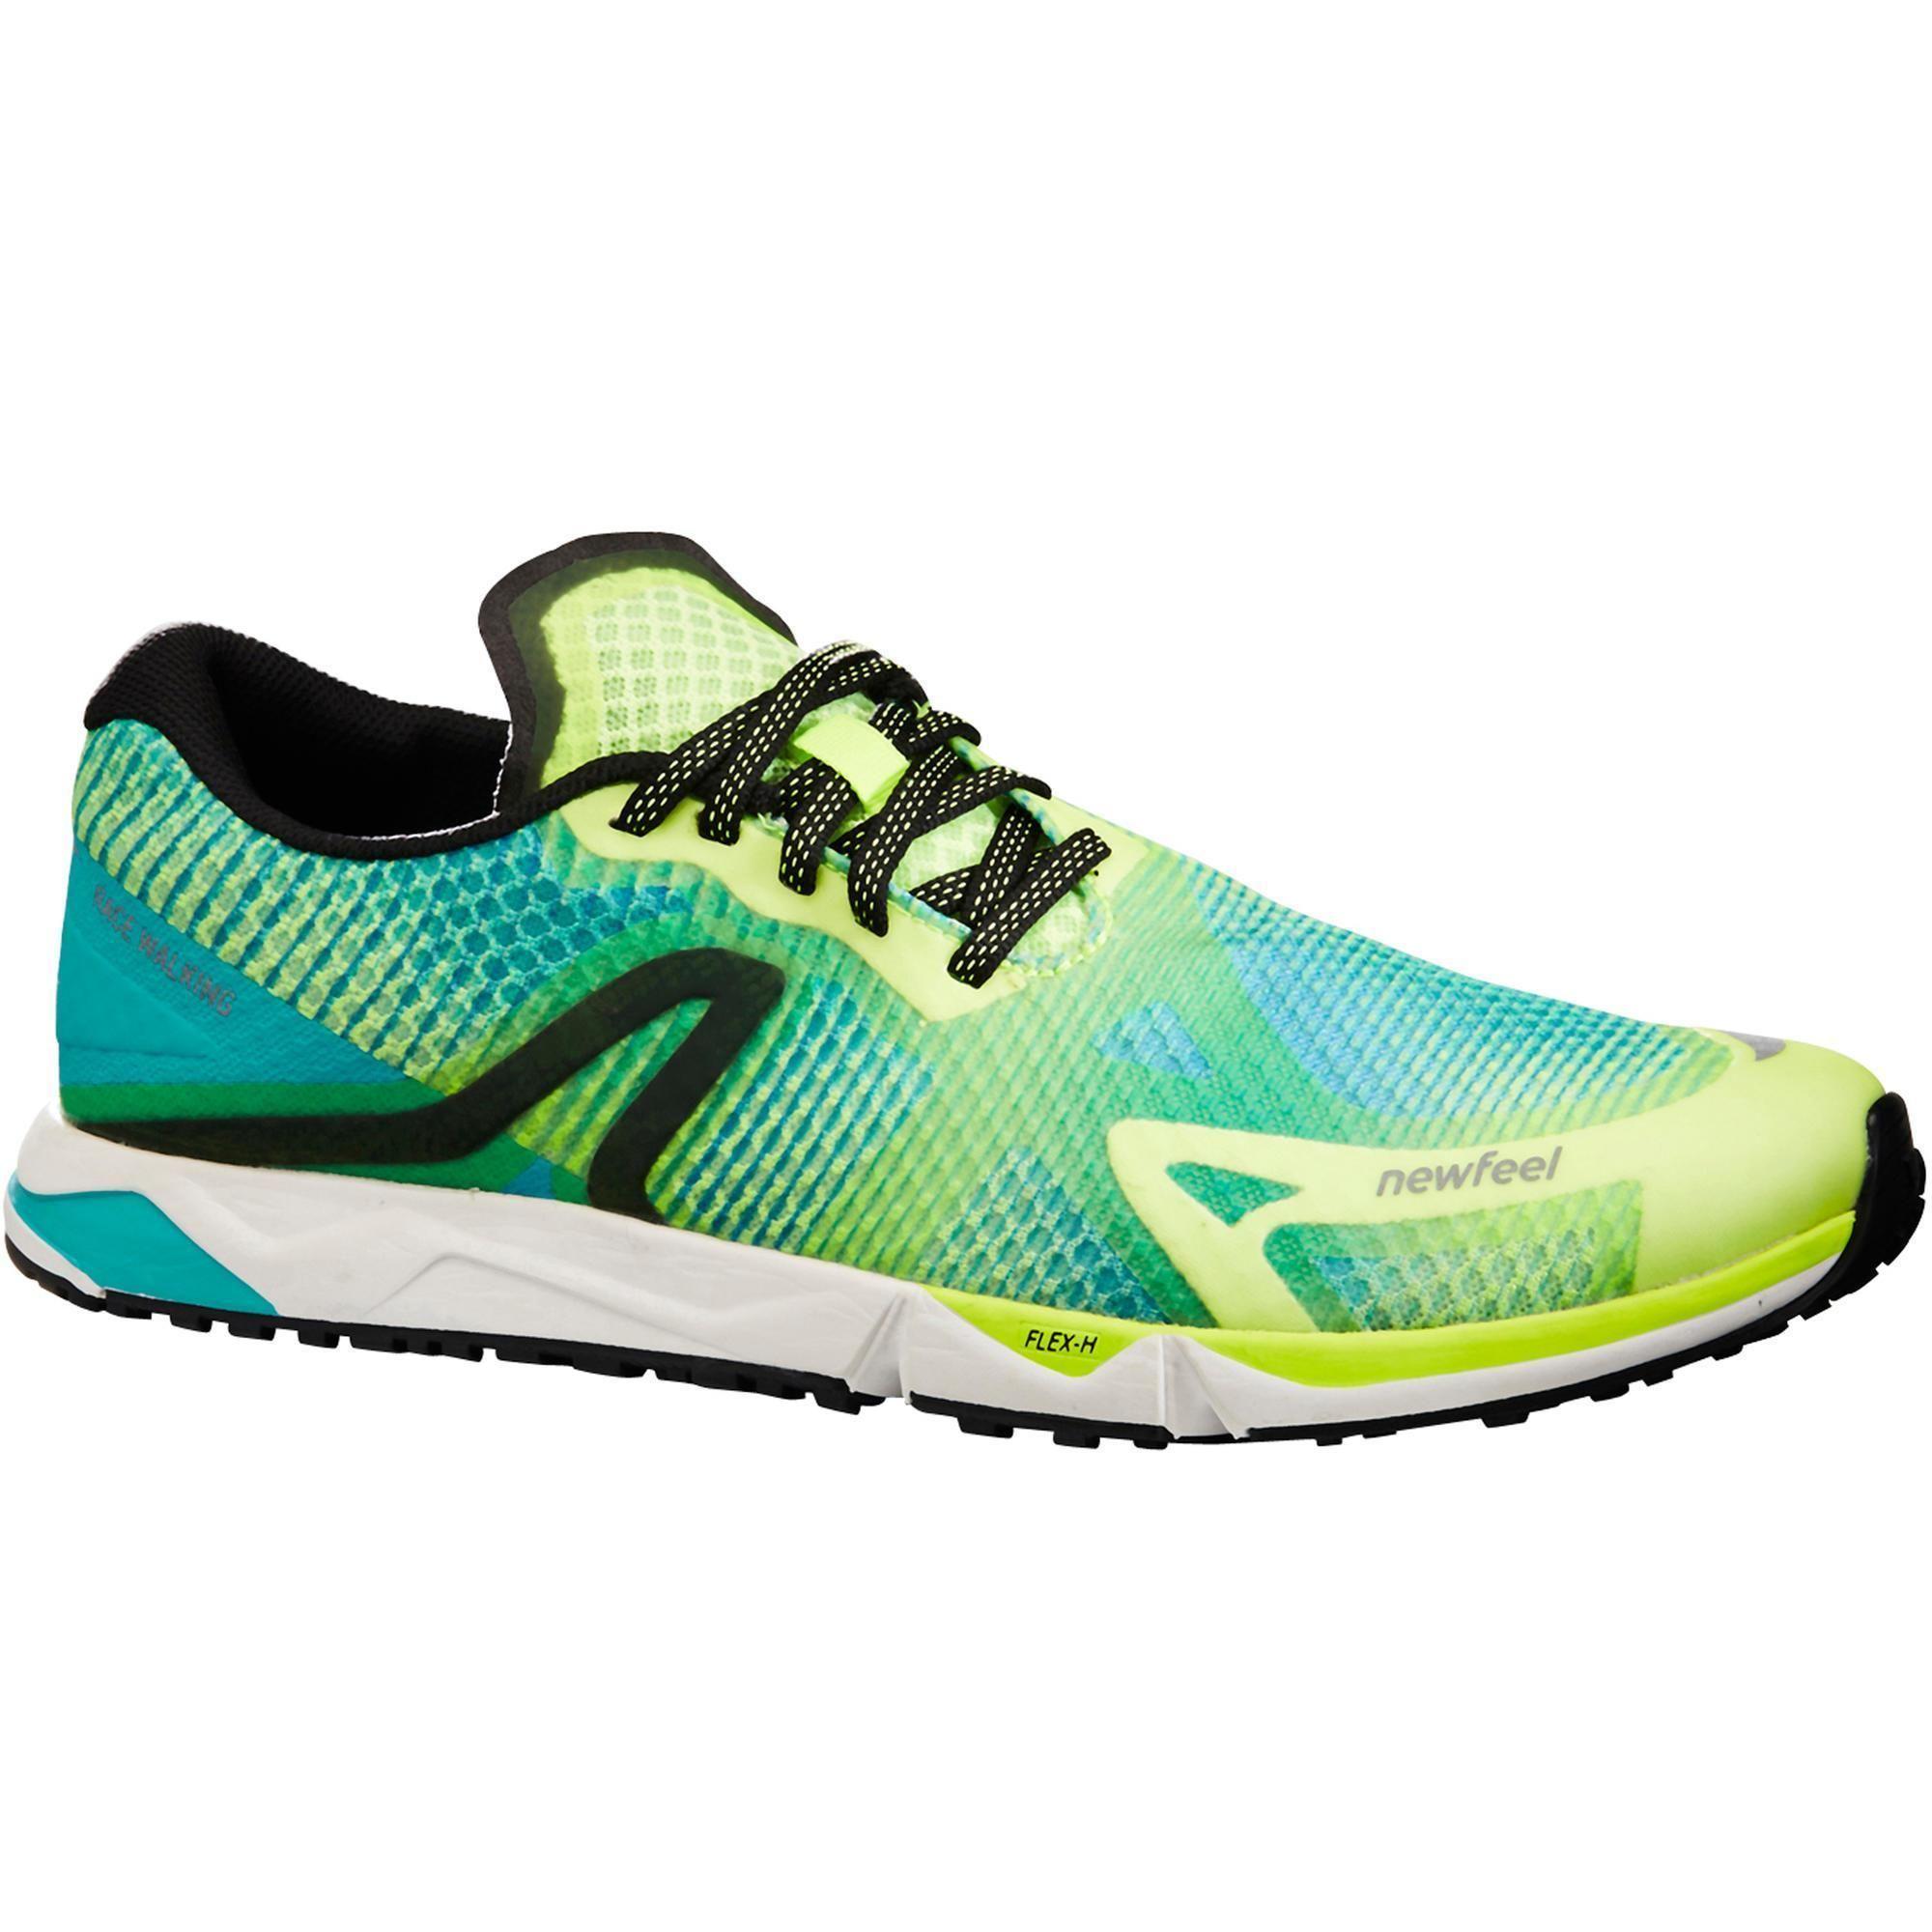 bfa8ee40afe87 Chaussures de marche athlétique RW 900 jaunes et bleues | Newfeel ...